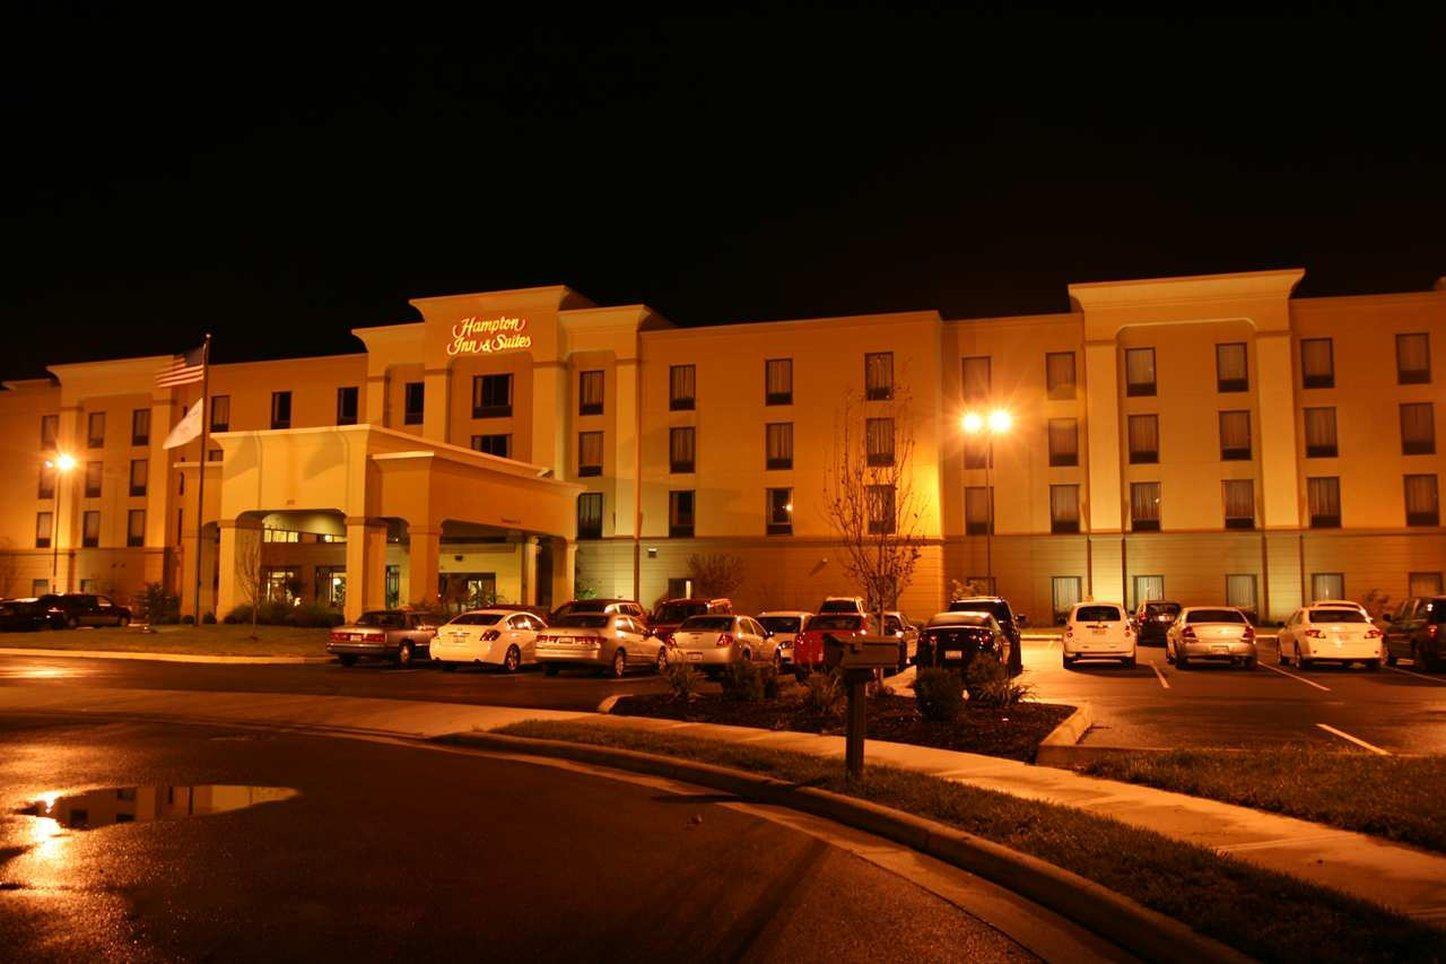 Hampton Inn And Suites Wilmington